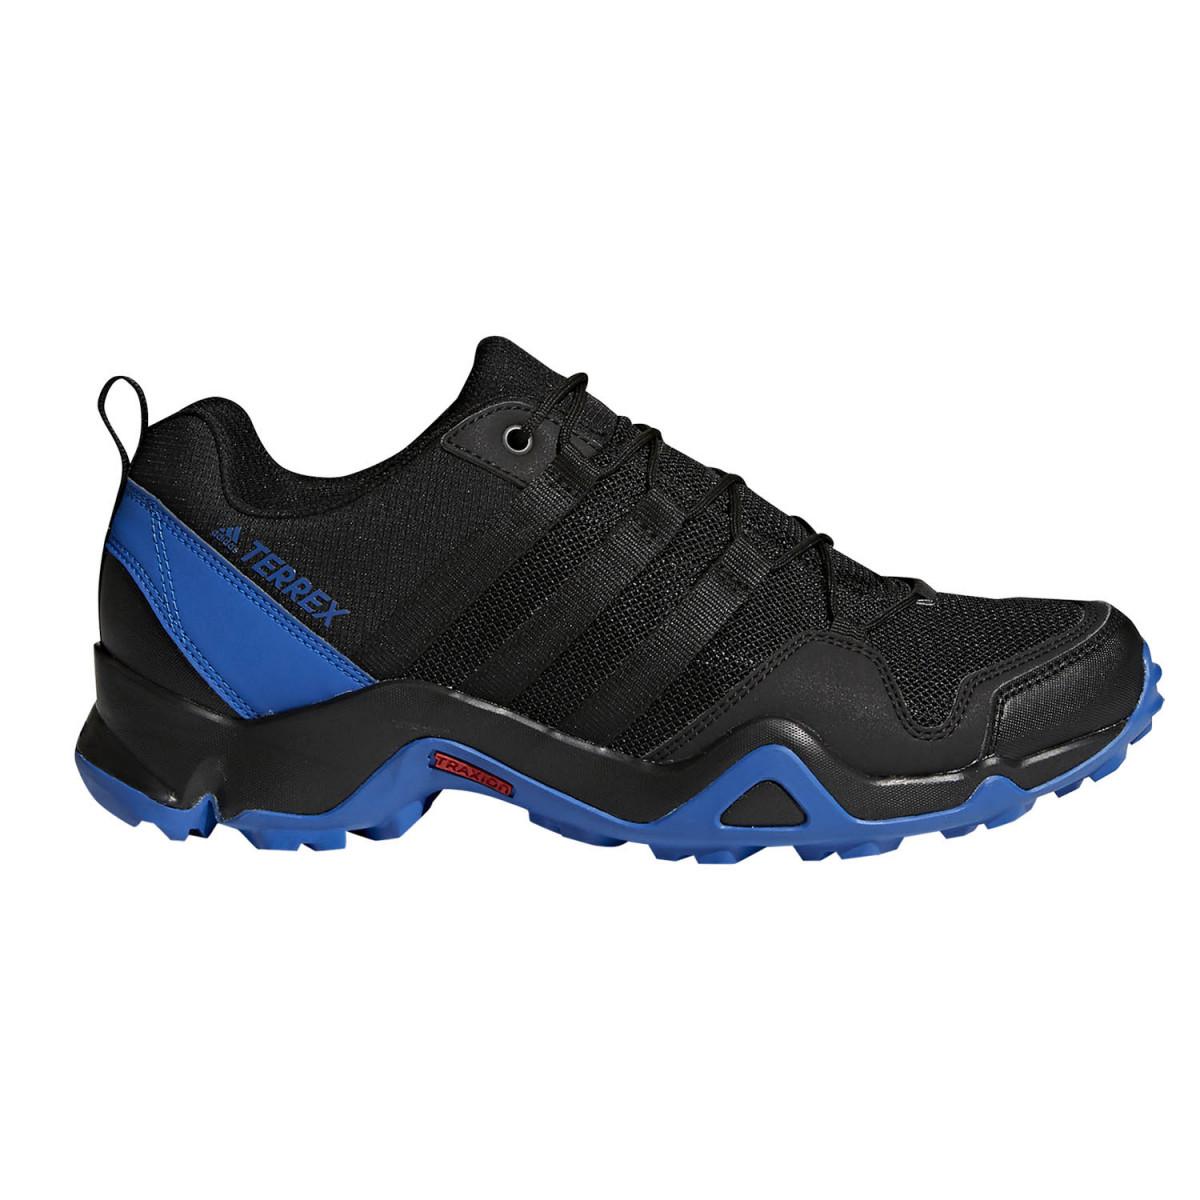 082272f6a93 Zapatillas Adidas Terrex Ax2r - Ofertas - Hombre